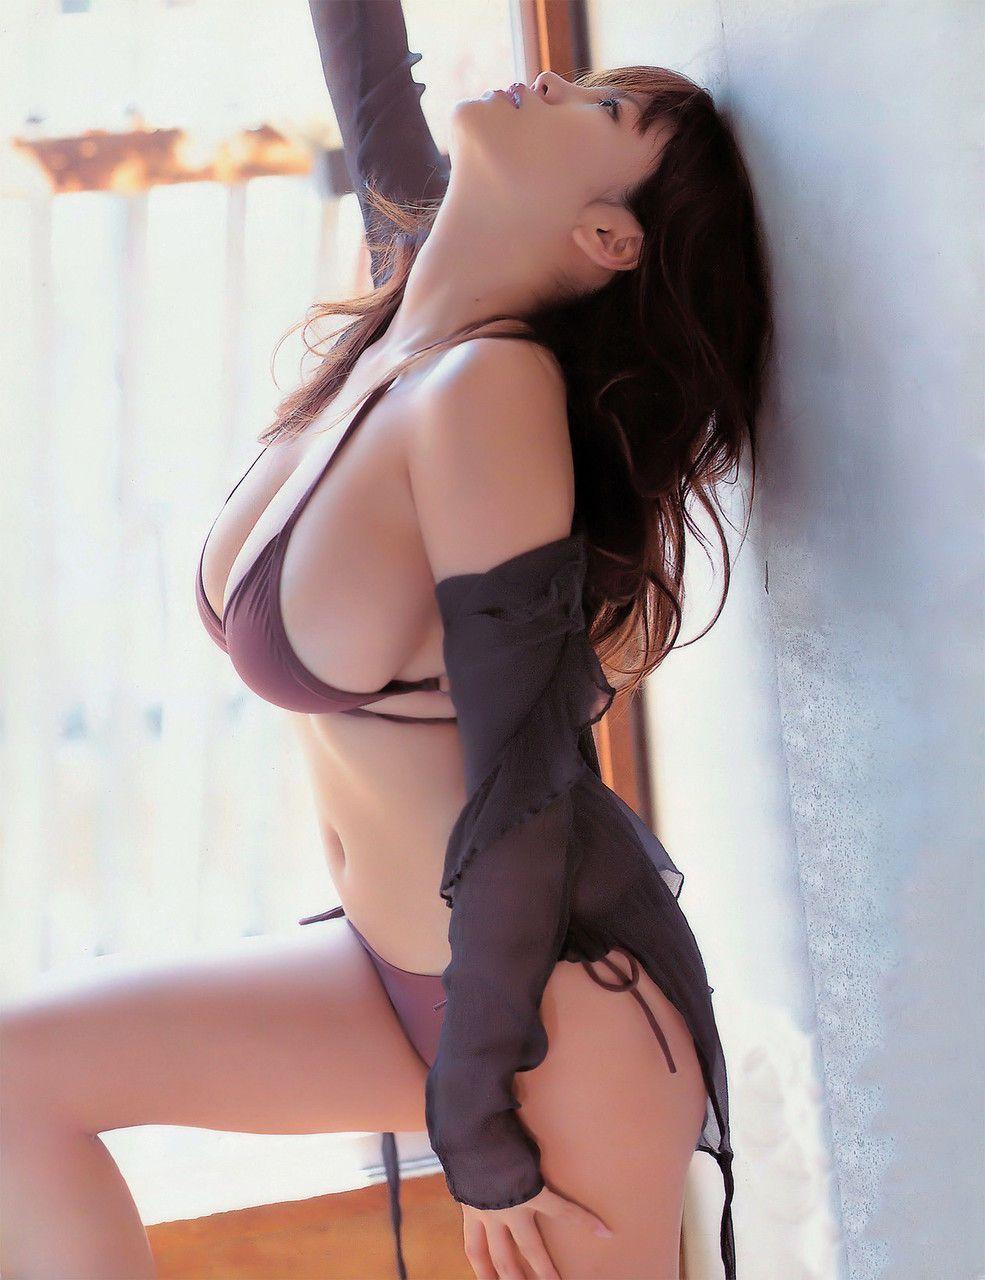 nude girl ass married